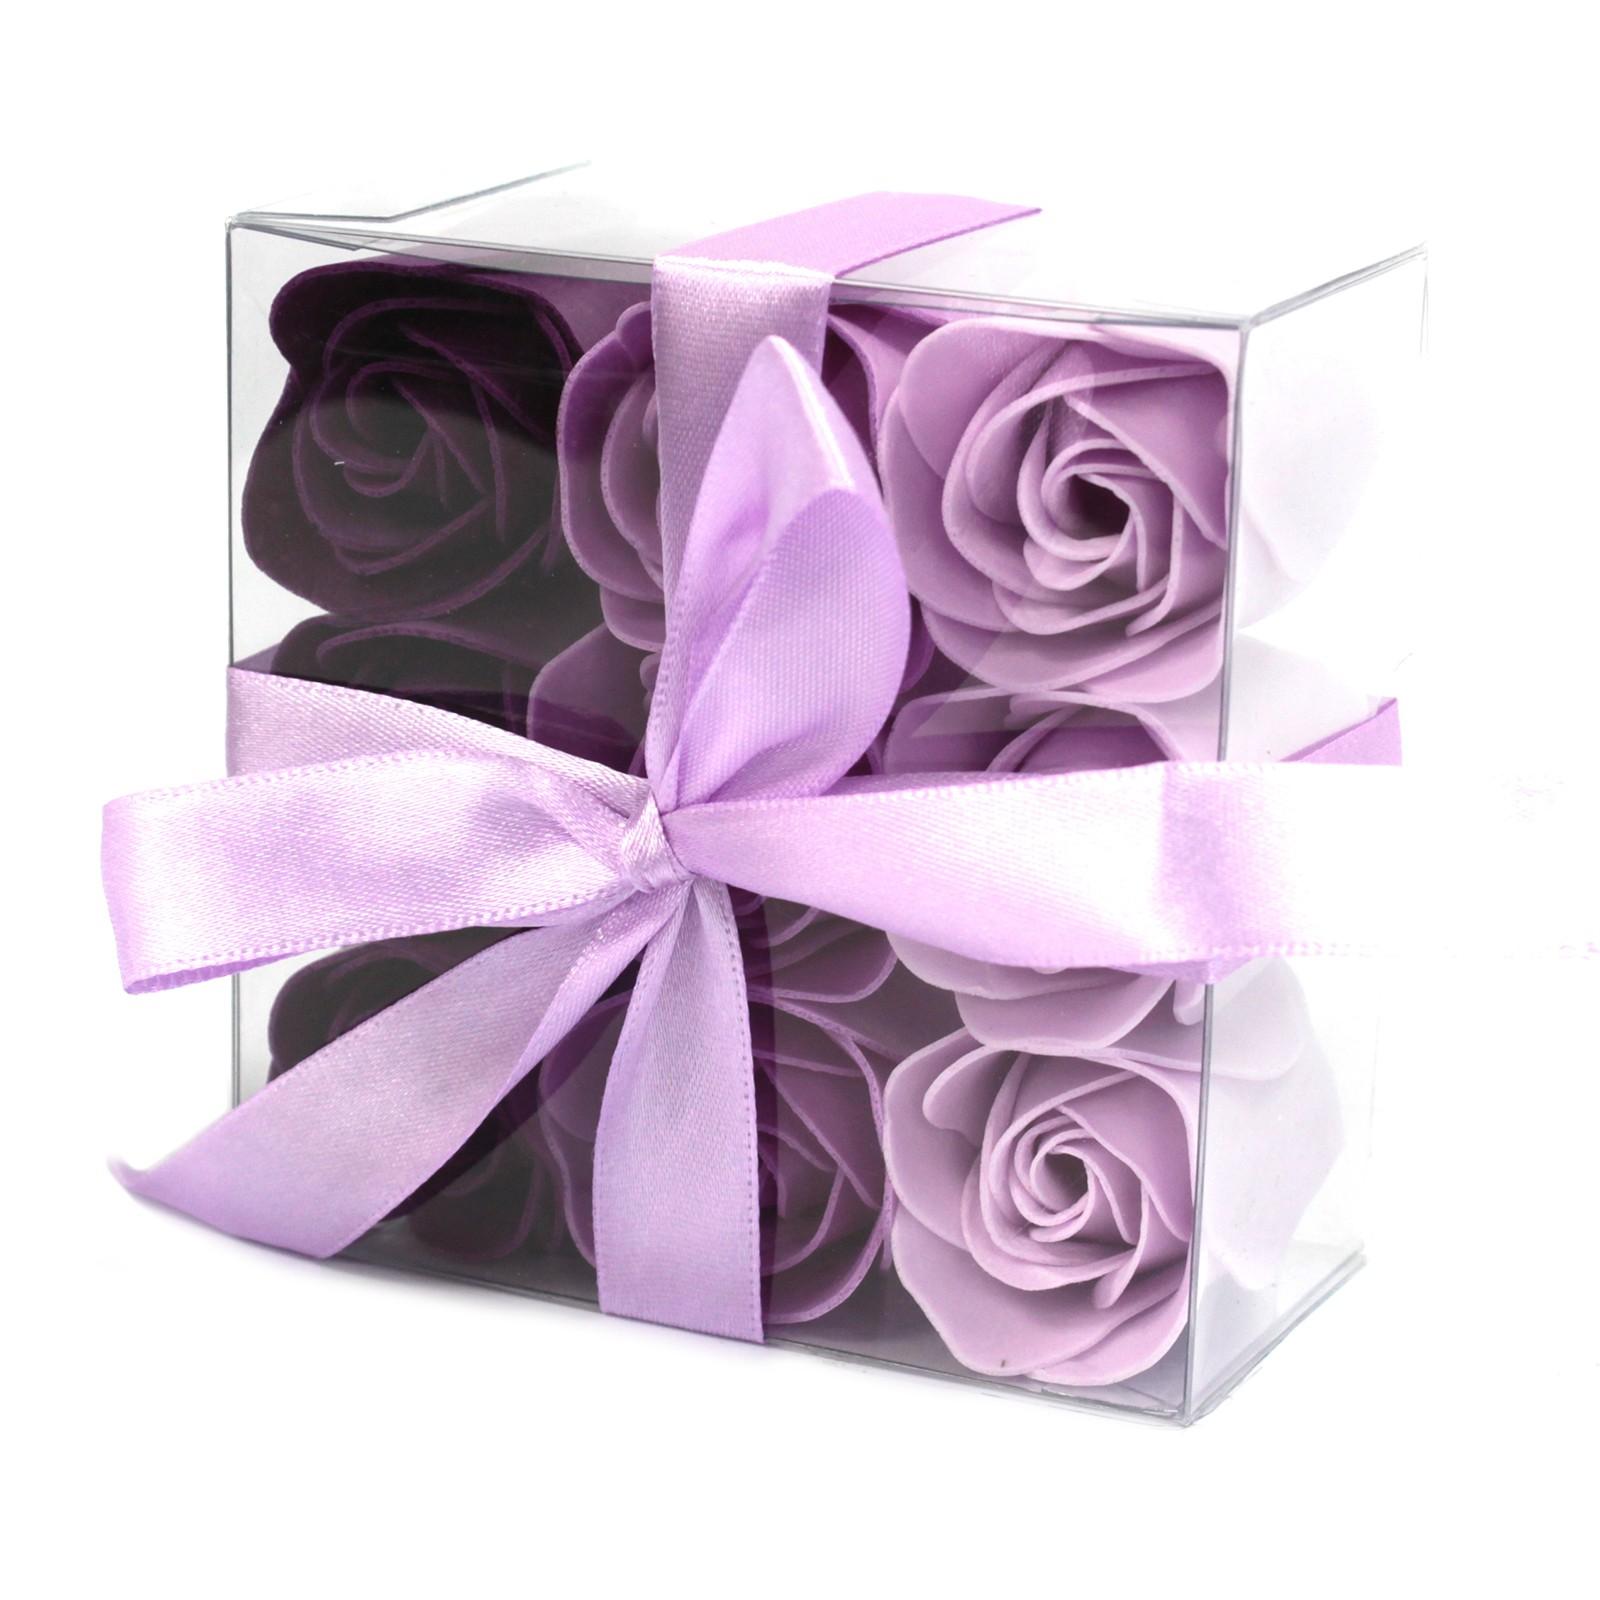 Set of 9 Soap Flower Lavender Roses